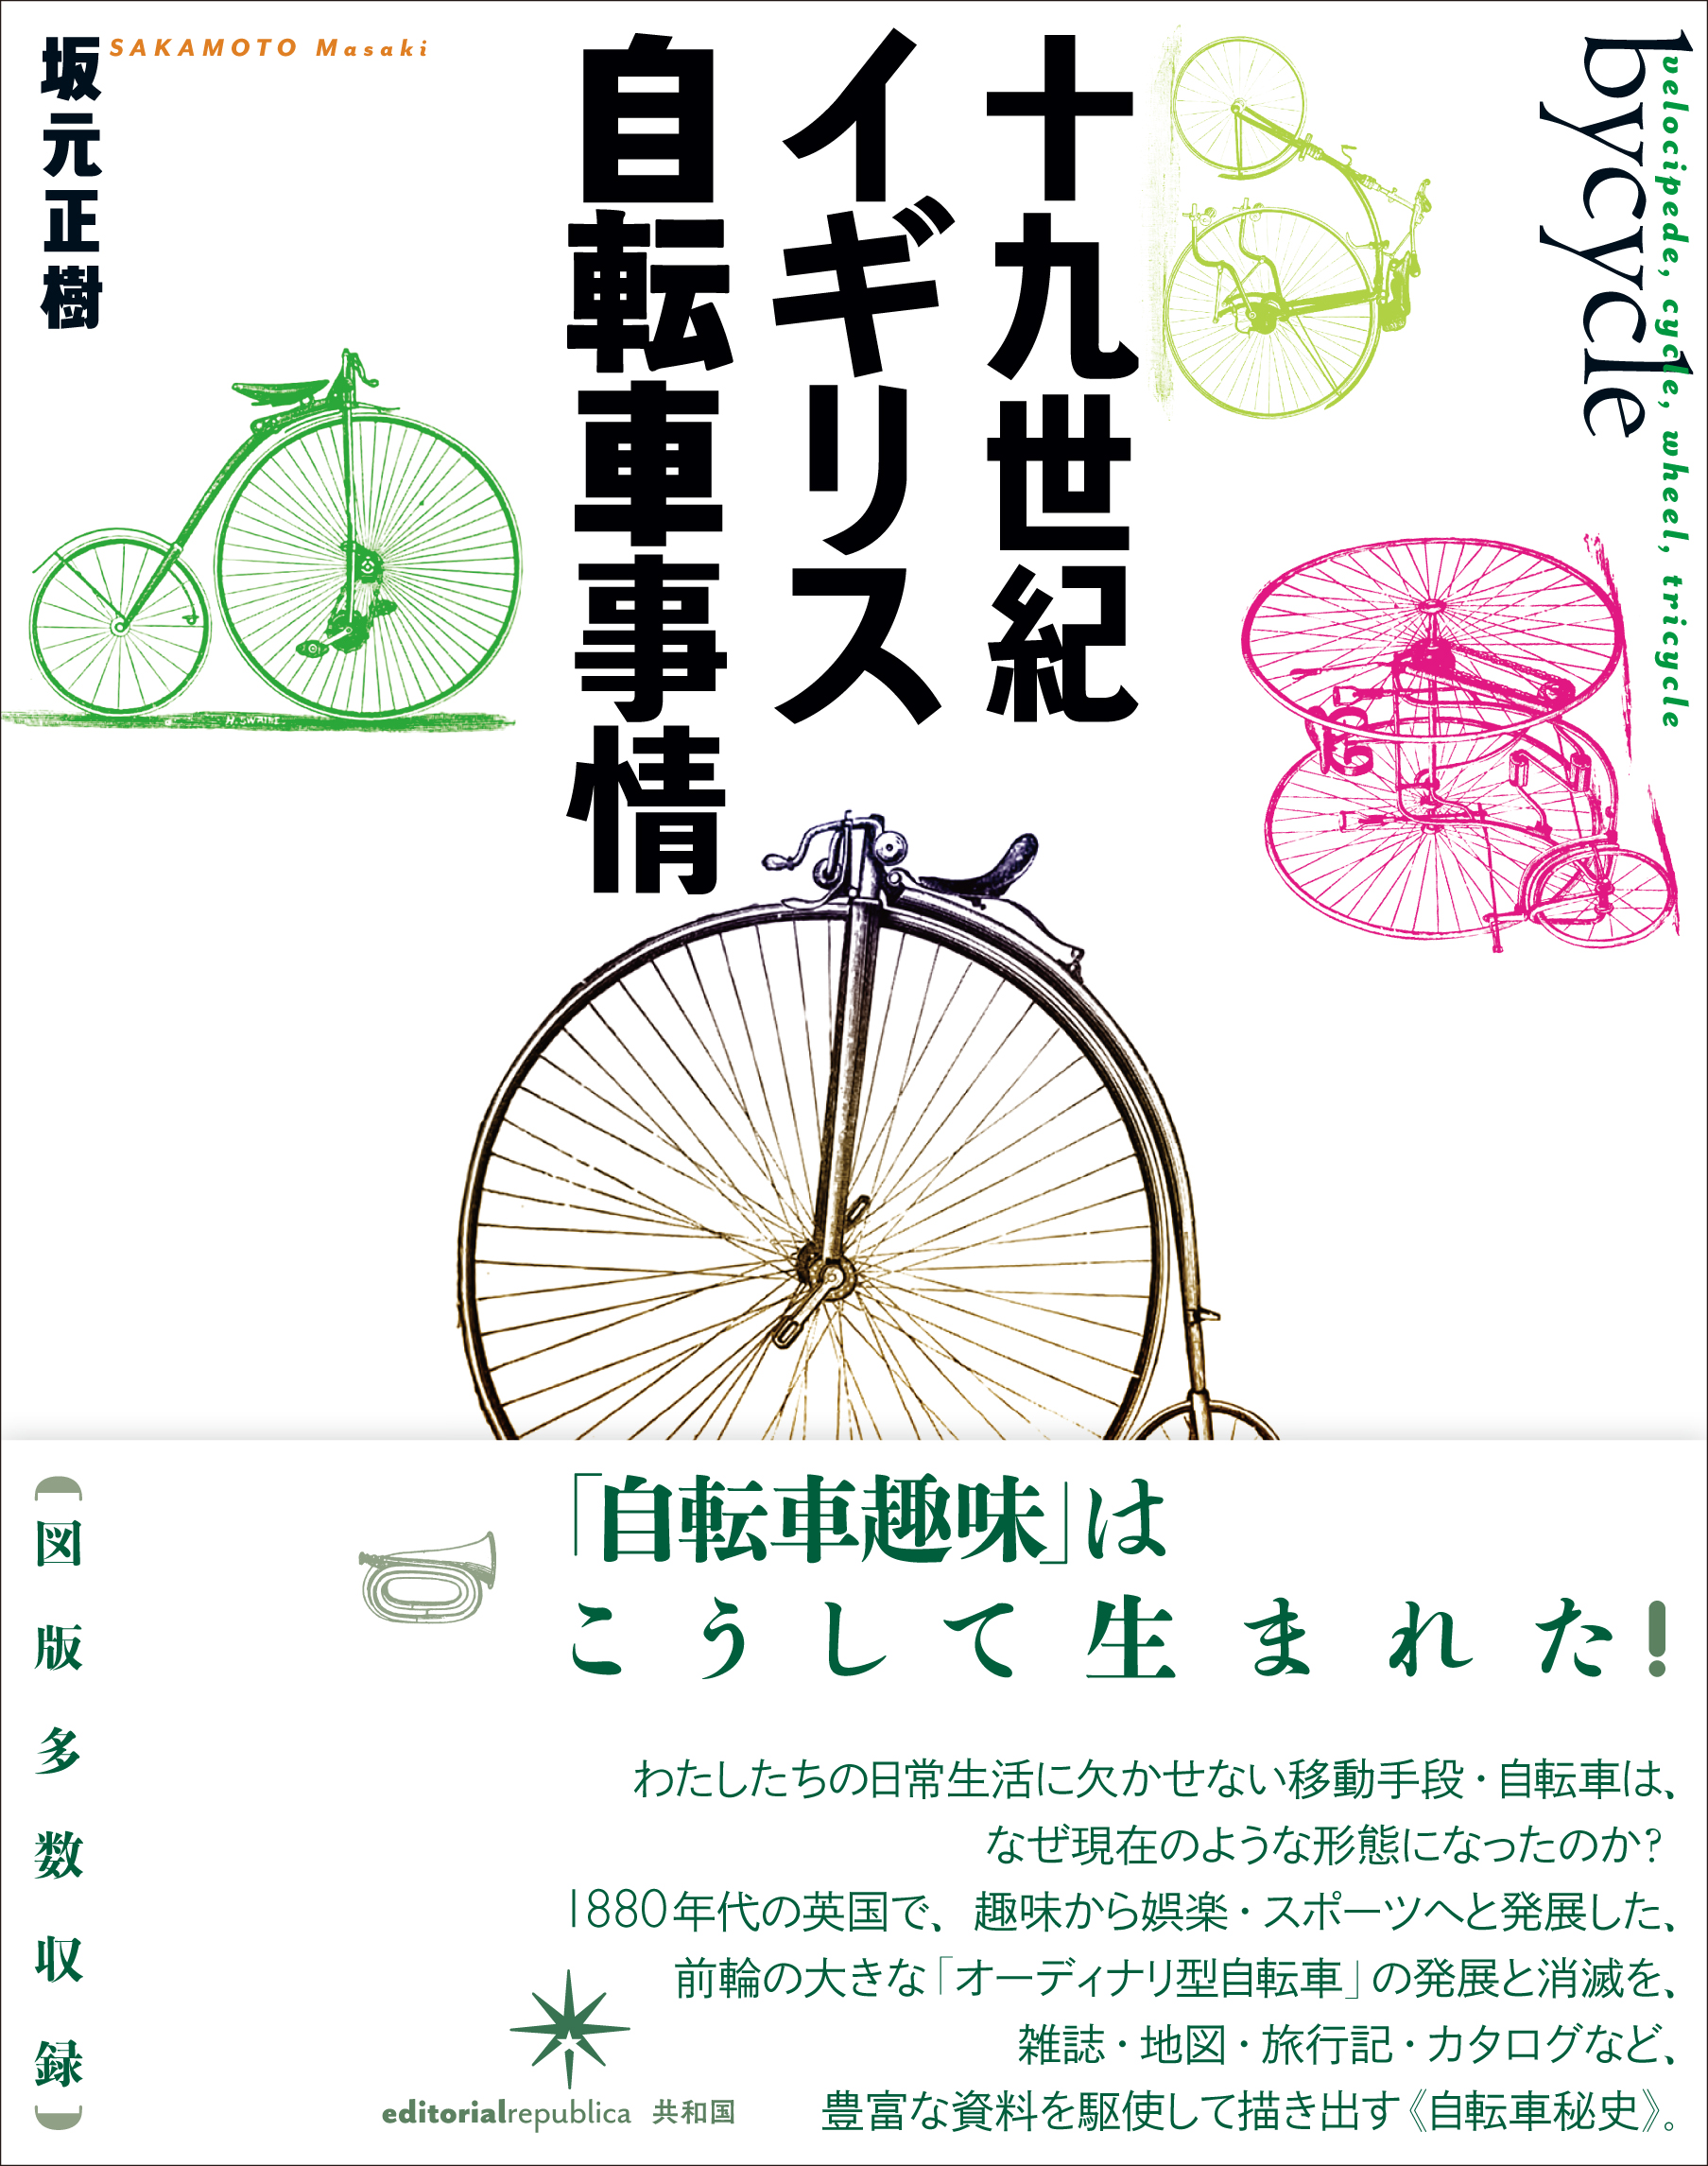 坂元正樹 十九世紀イギリス自転車事情